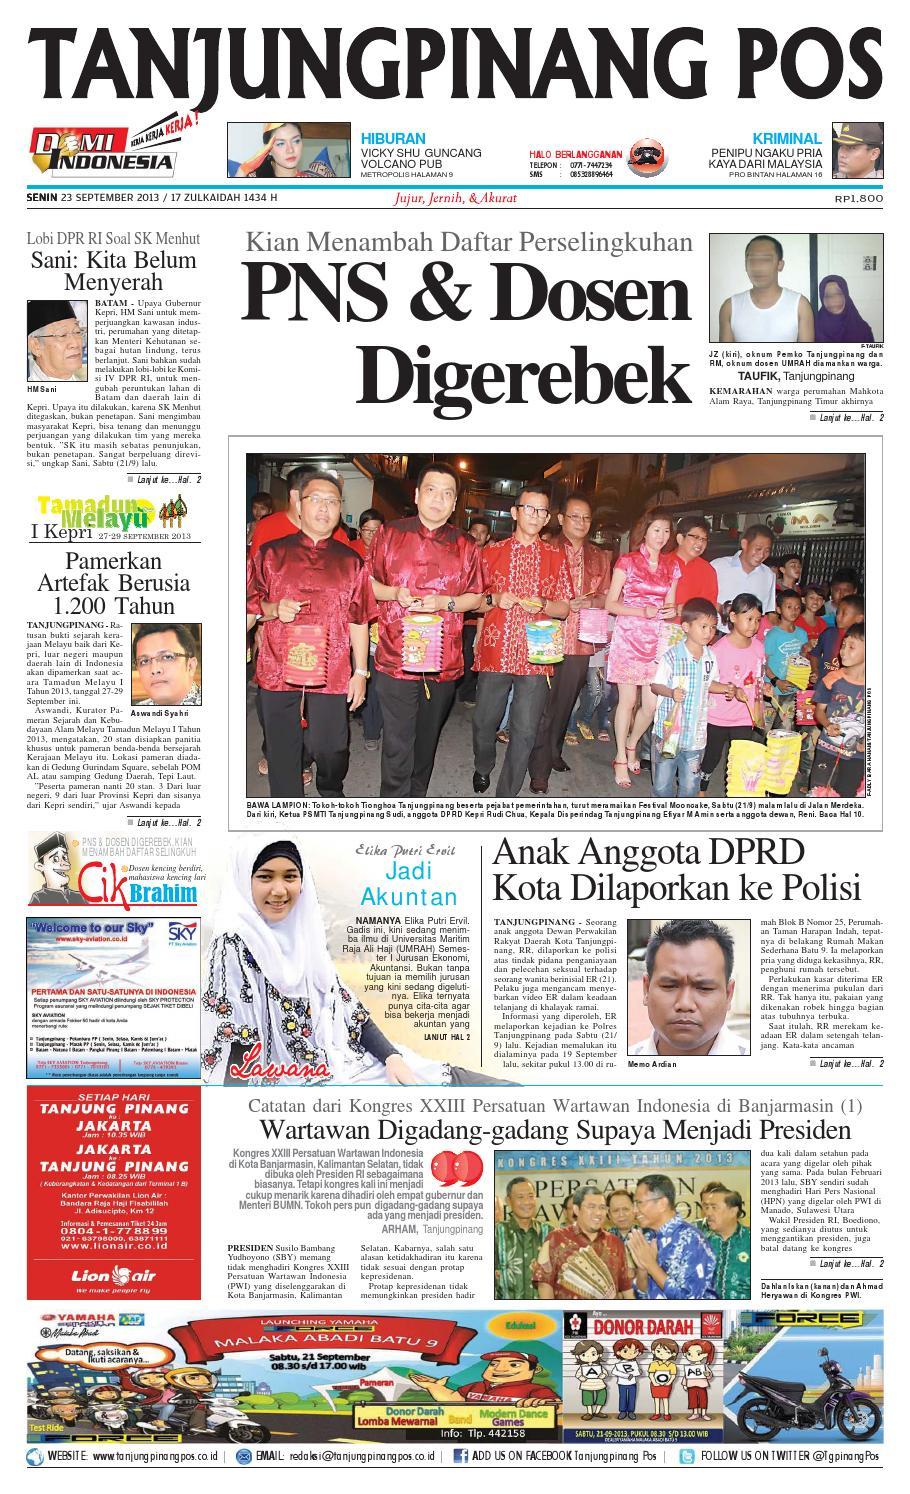 epaper tanjungpinangpos 23 september 2013 by